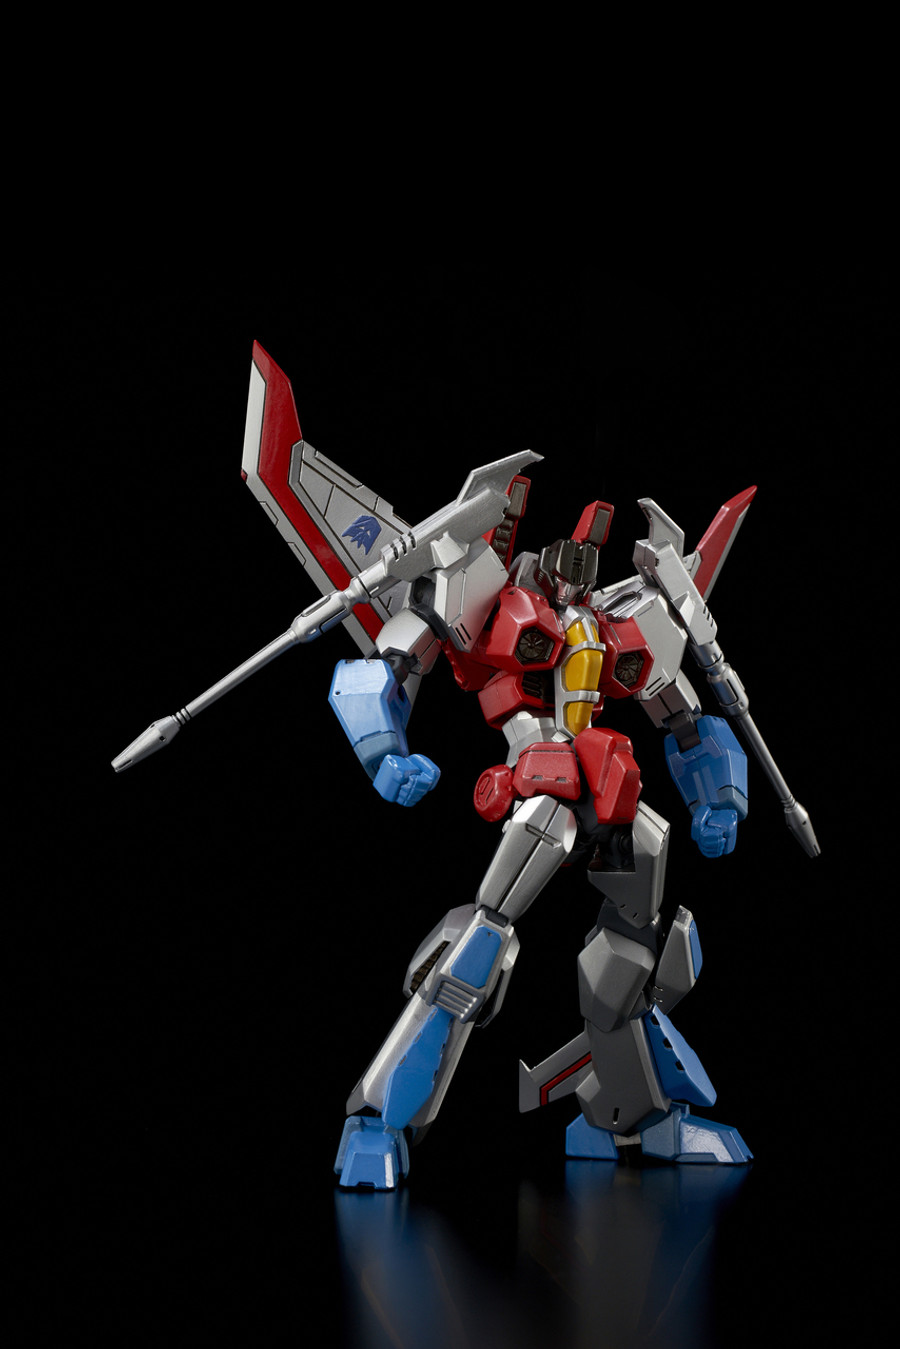 Flame Toys - Furai Model 02: Starscream Model Kit